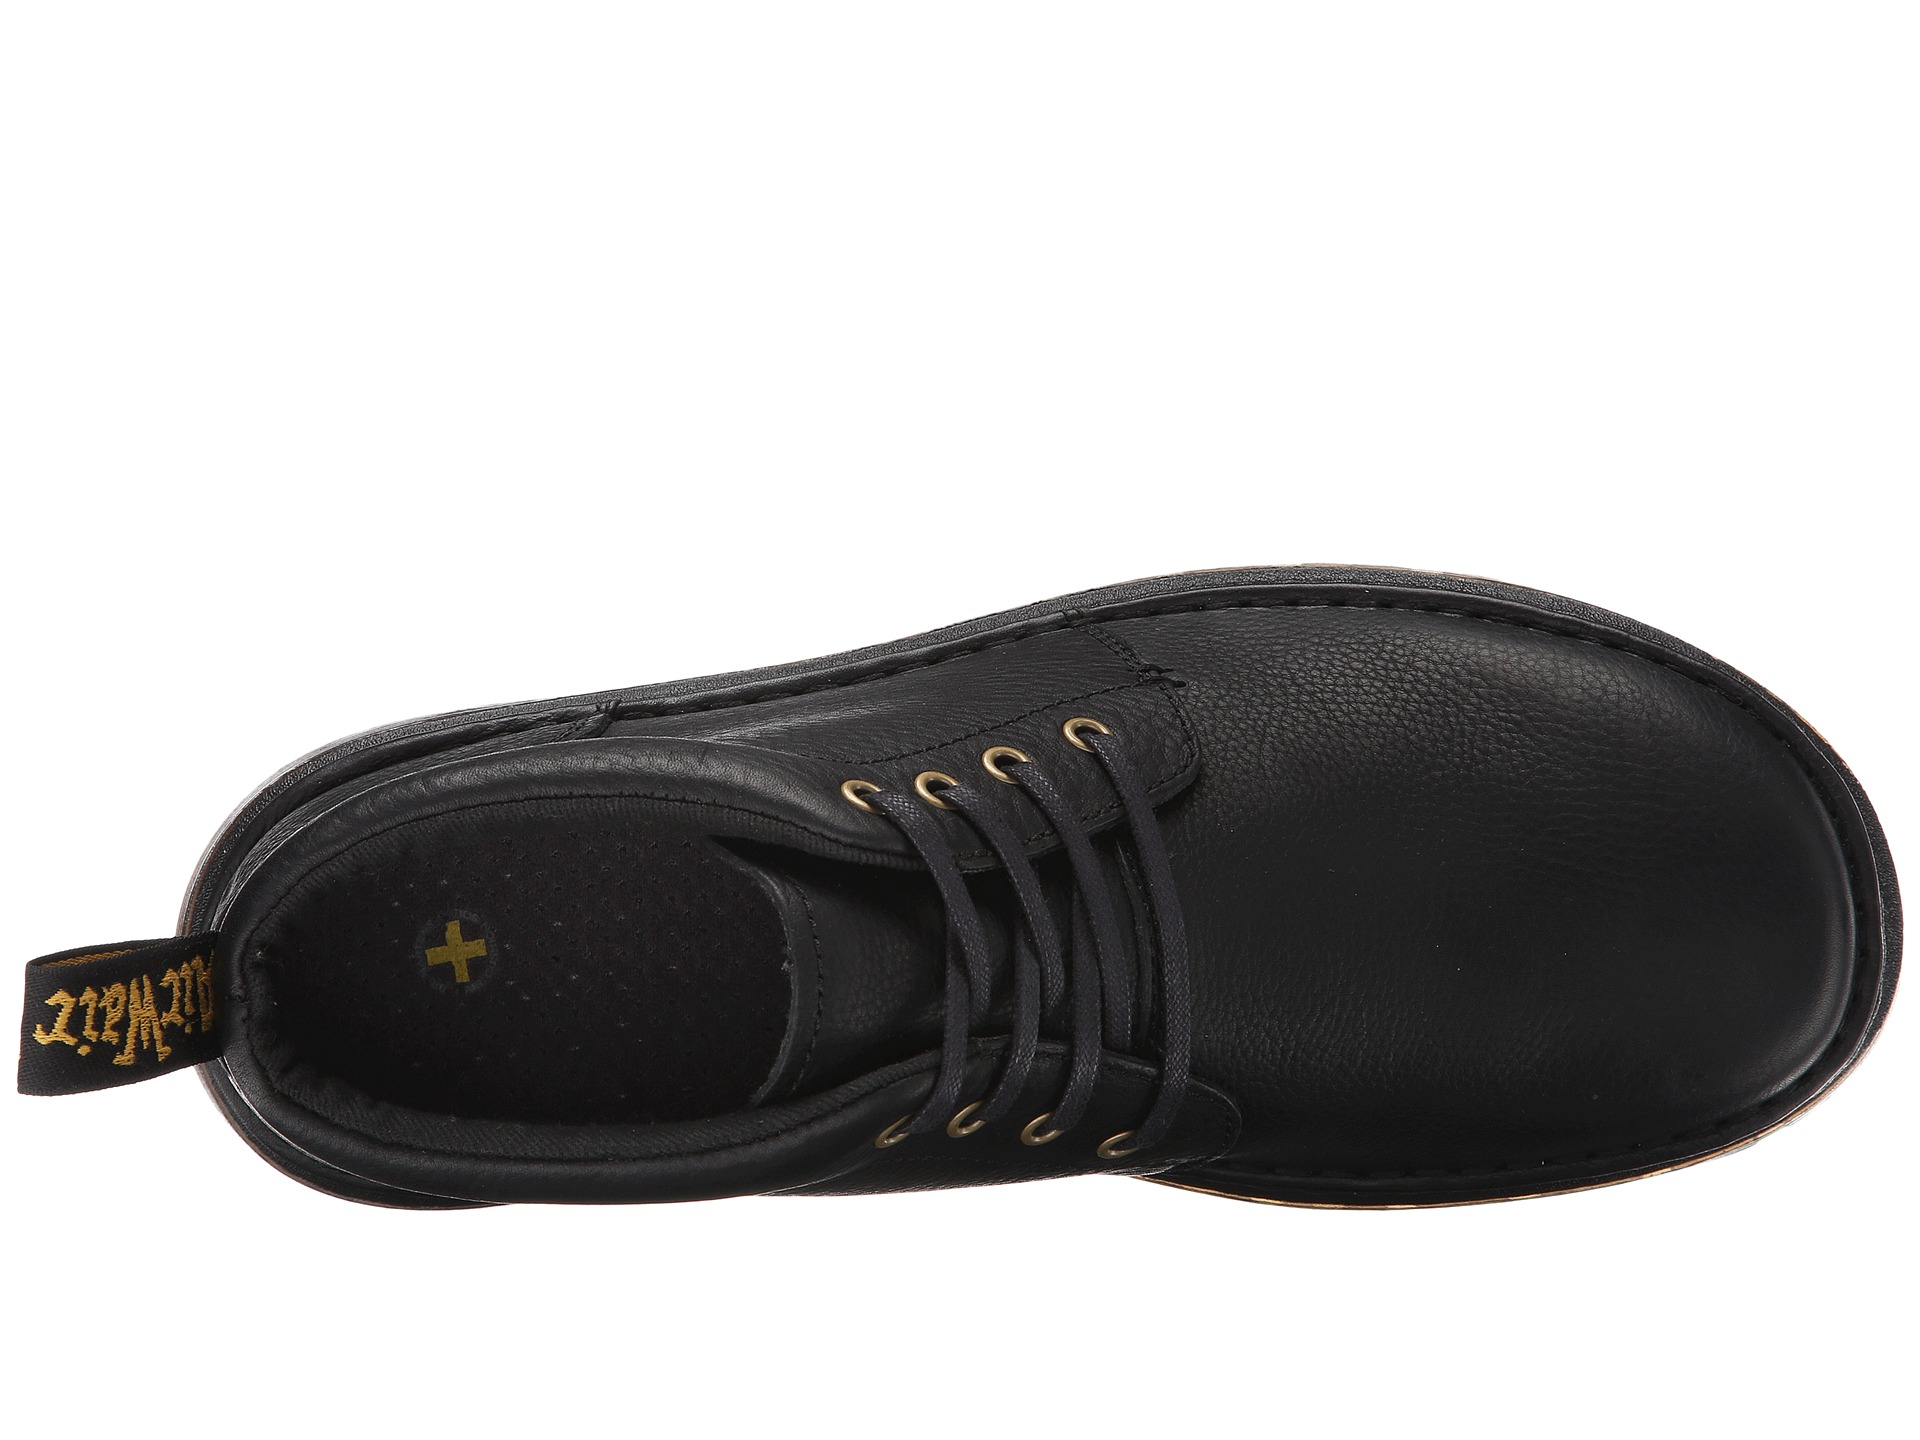 78eaa48a03498 Dr. Martens Lea 4-eye Chukka Boot in Black for Men - Lyst